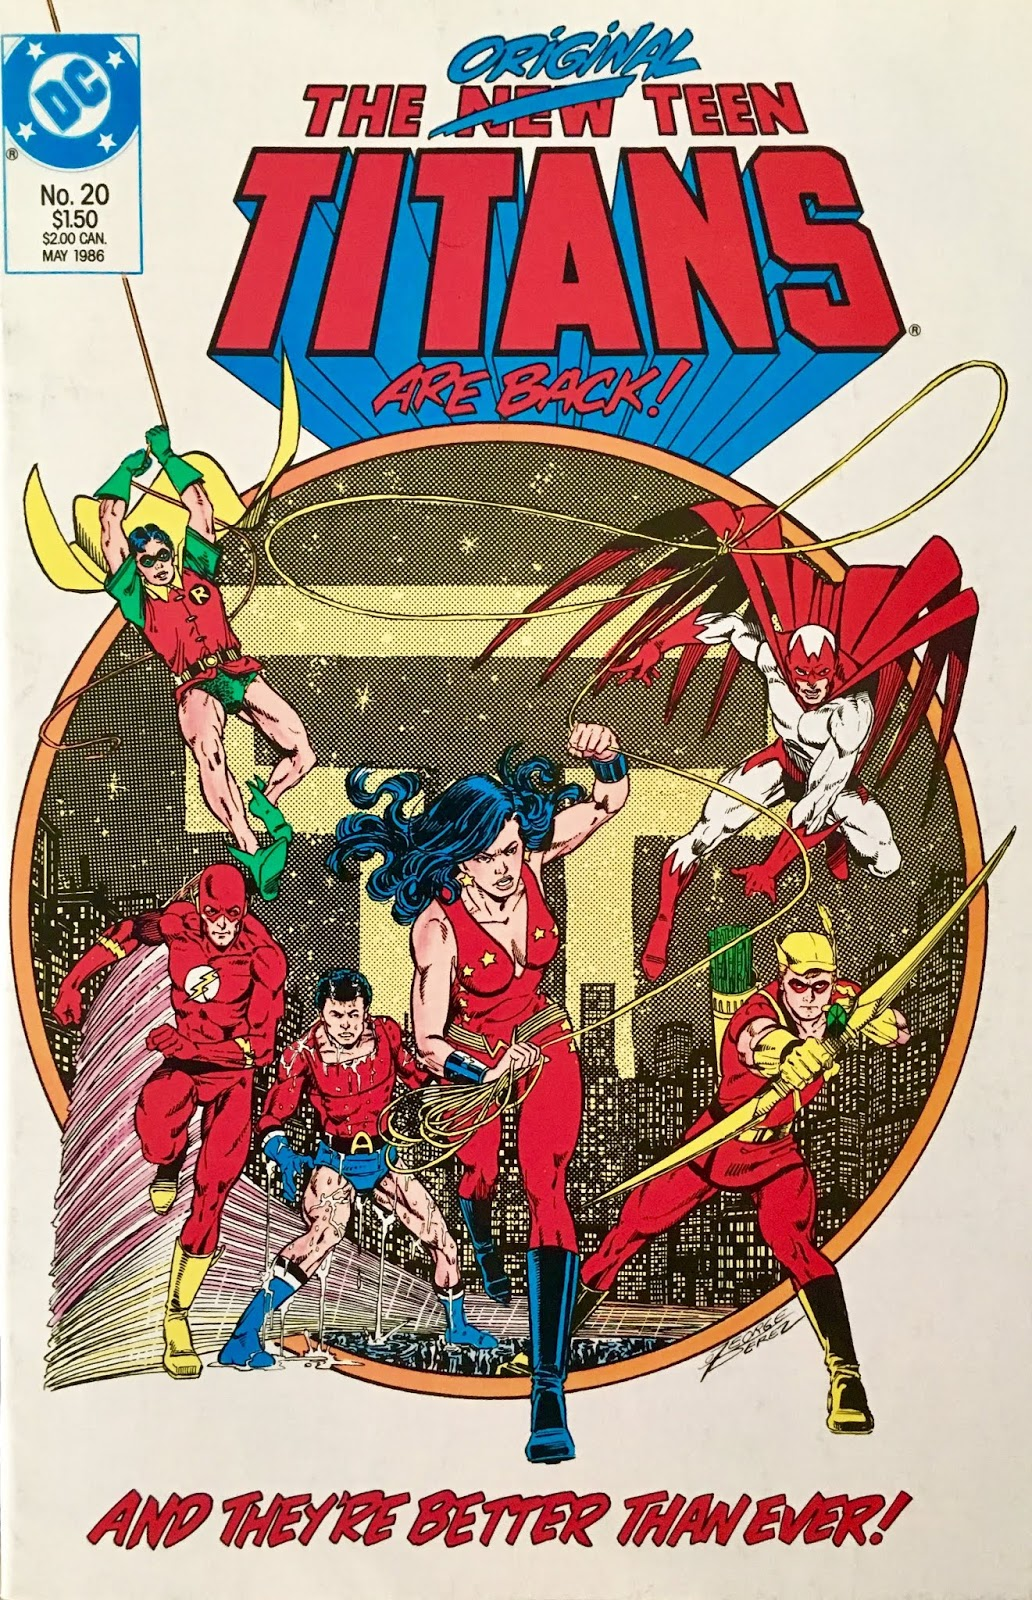 Chris is on Infinite Earths: New Teen Titans (vol 2) #20 (1986)